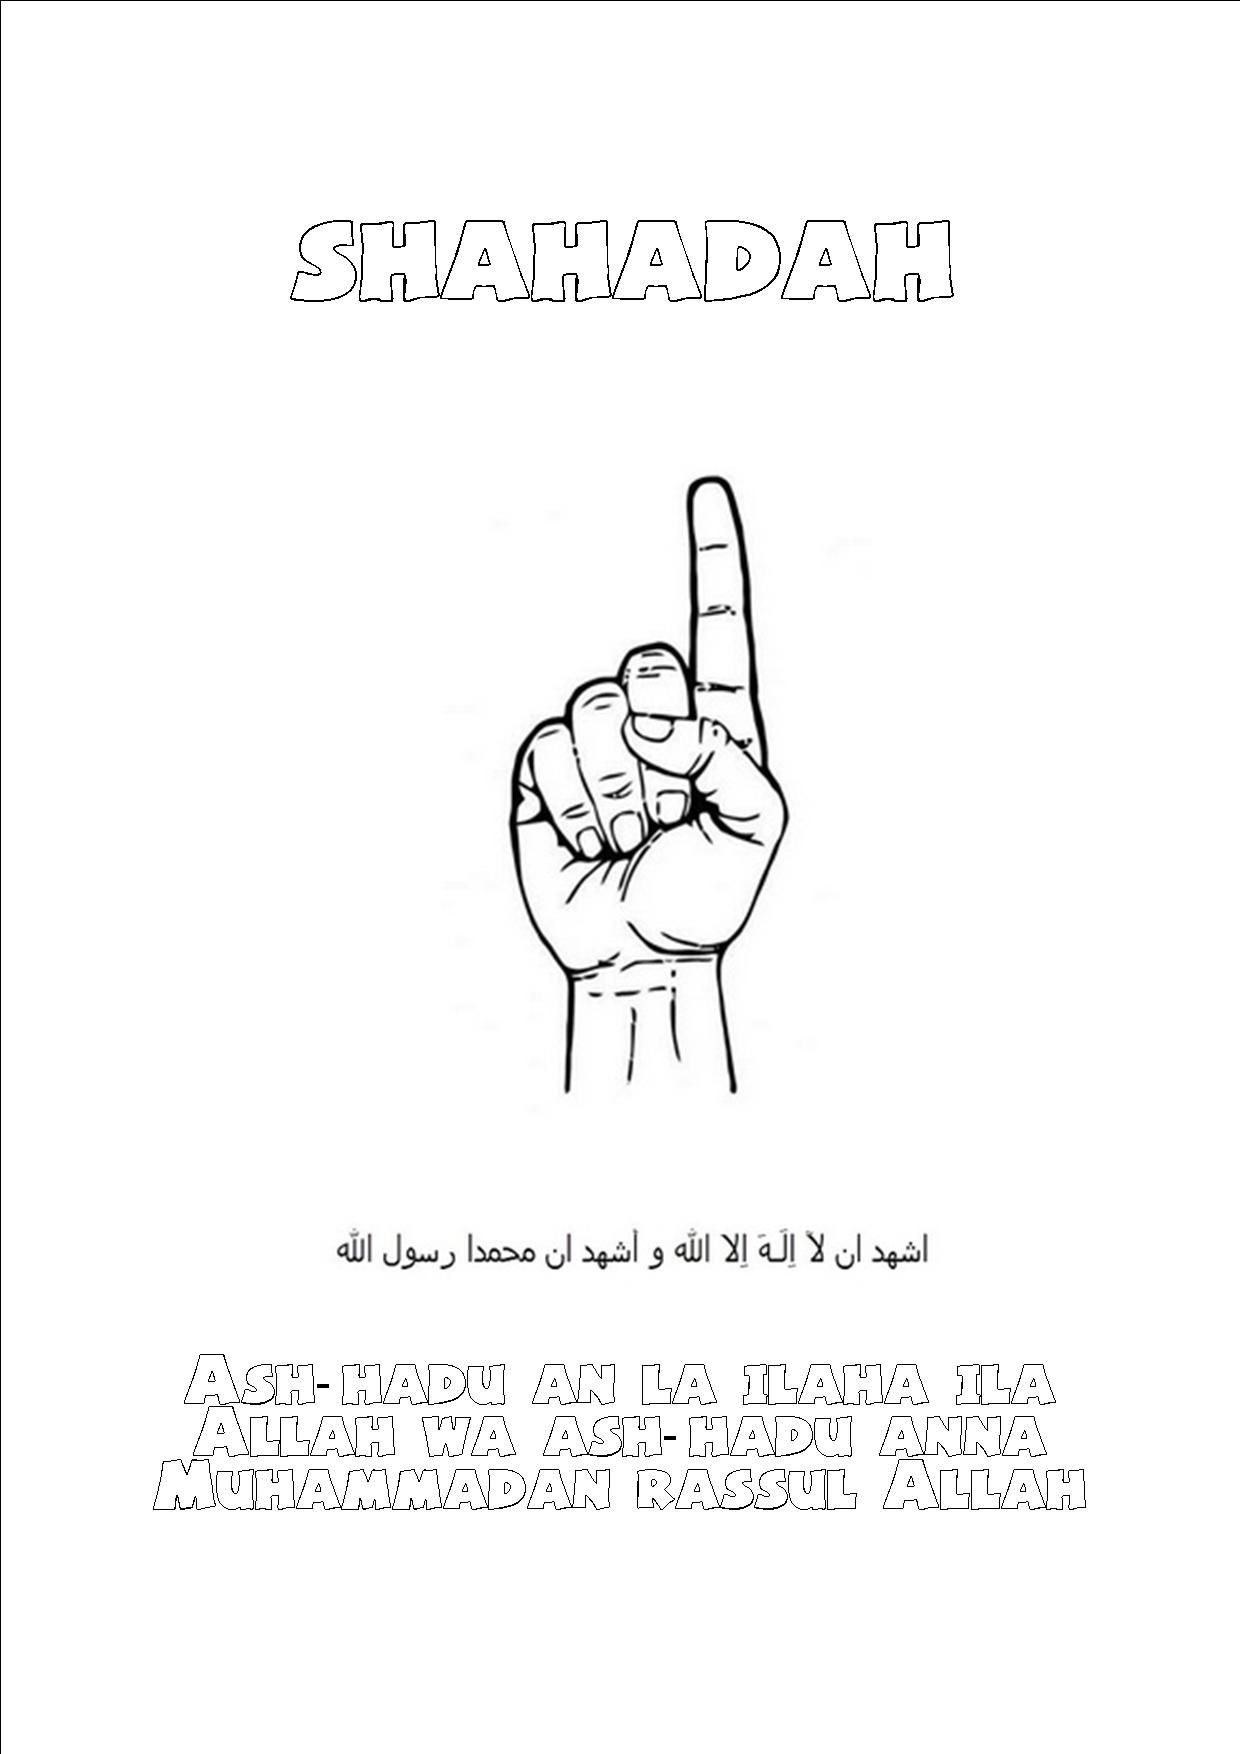 Shahadah Colouring Sheet